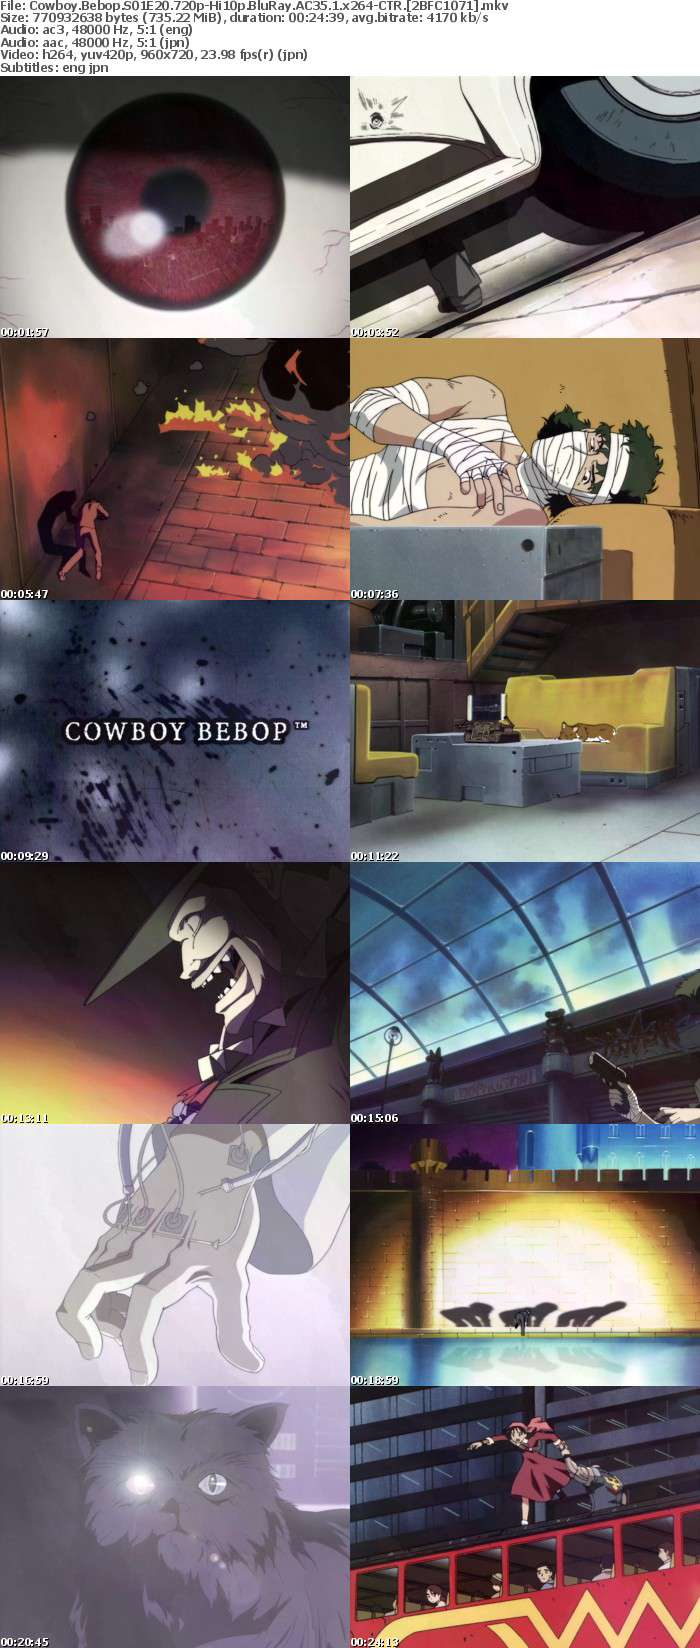 [CTR] Cowboy Bebop S01 Movie [720p Hi10 BluRay AC3 5 1 x264]